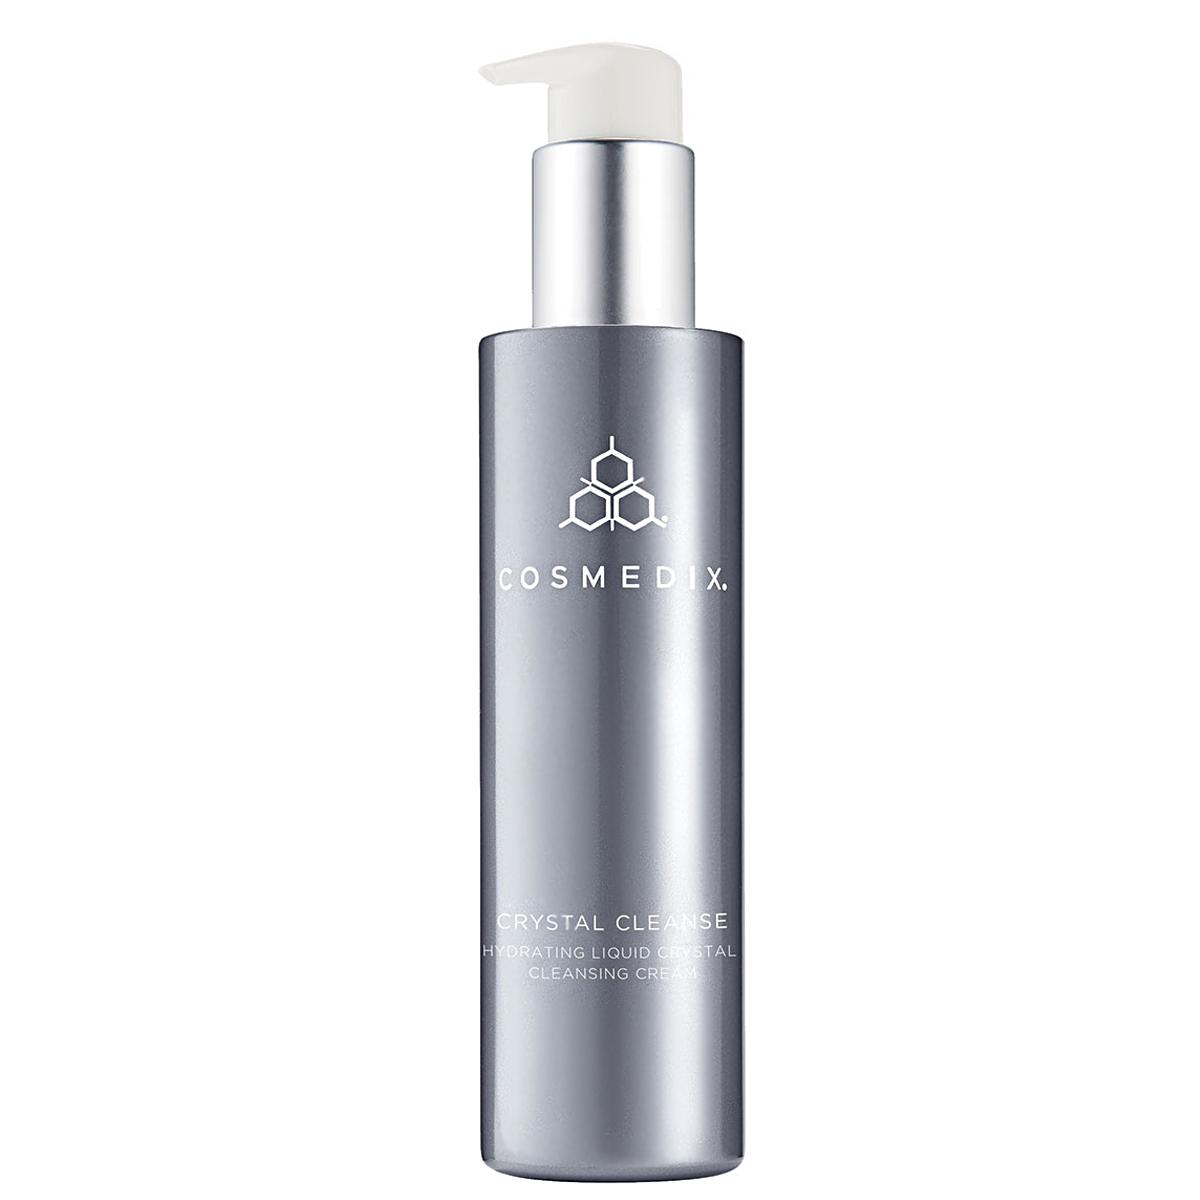 Крем для умывания Cosmedix Crystal Cleansing Cream 163.5 мл